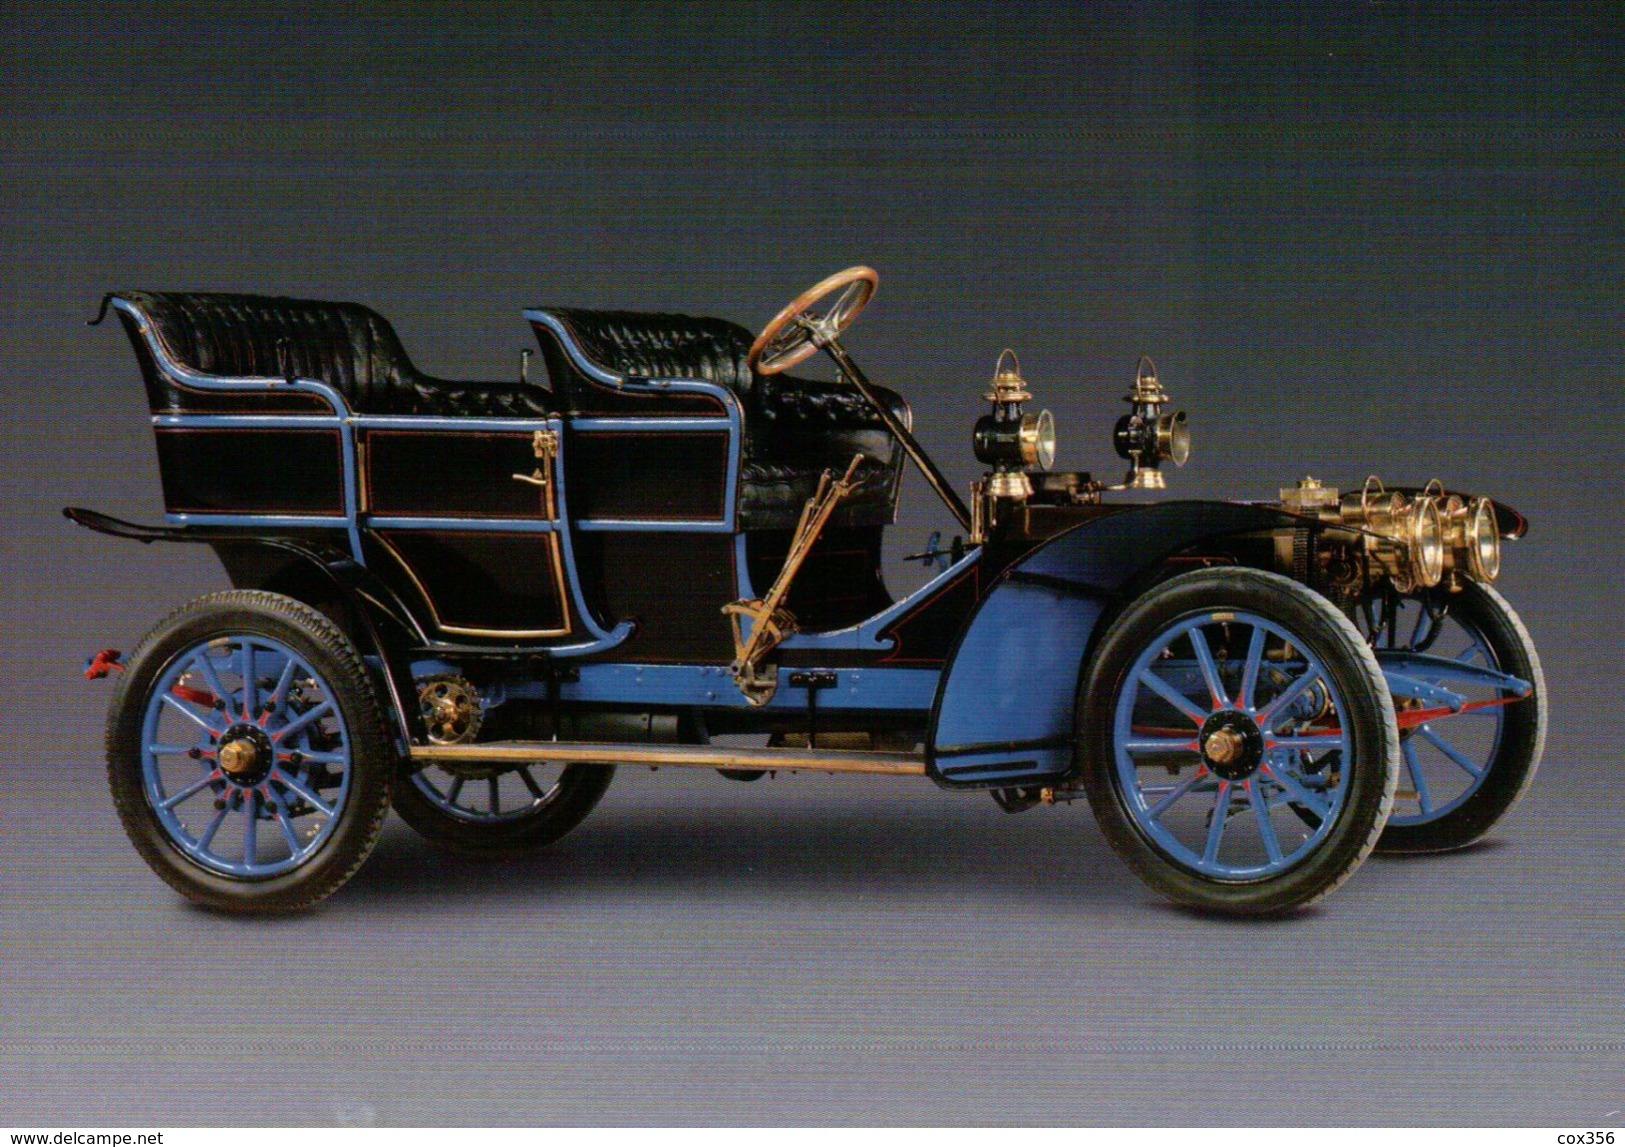 CPSM  AUTOMOBILES PEUGEOT DOUBLE PHATEON 1906 TYPE 78 A - Taxi & Carrozzelle